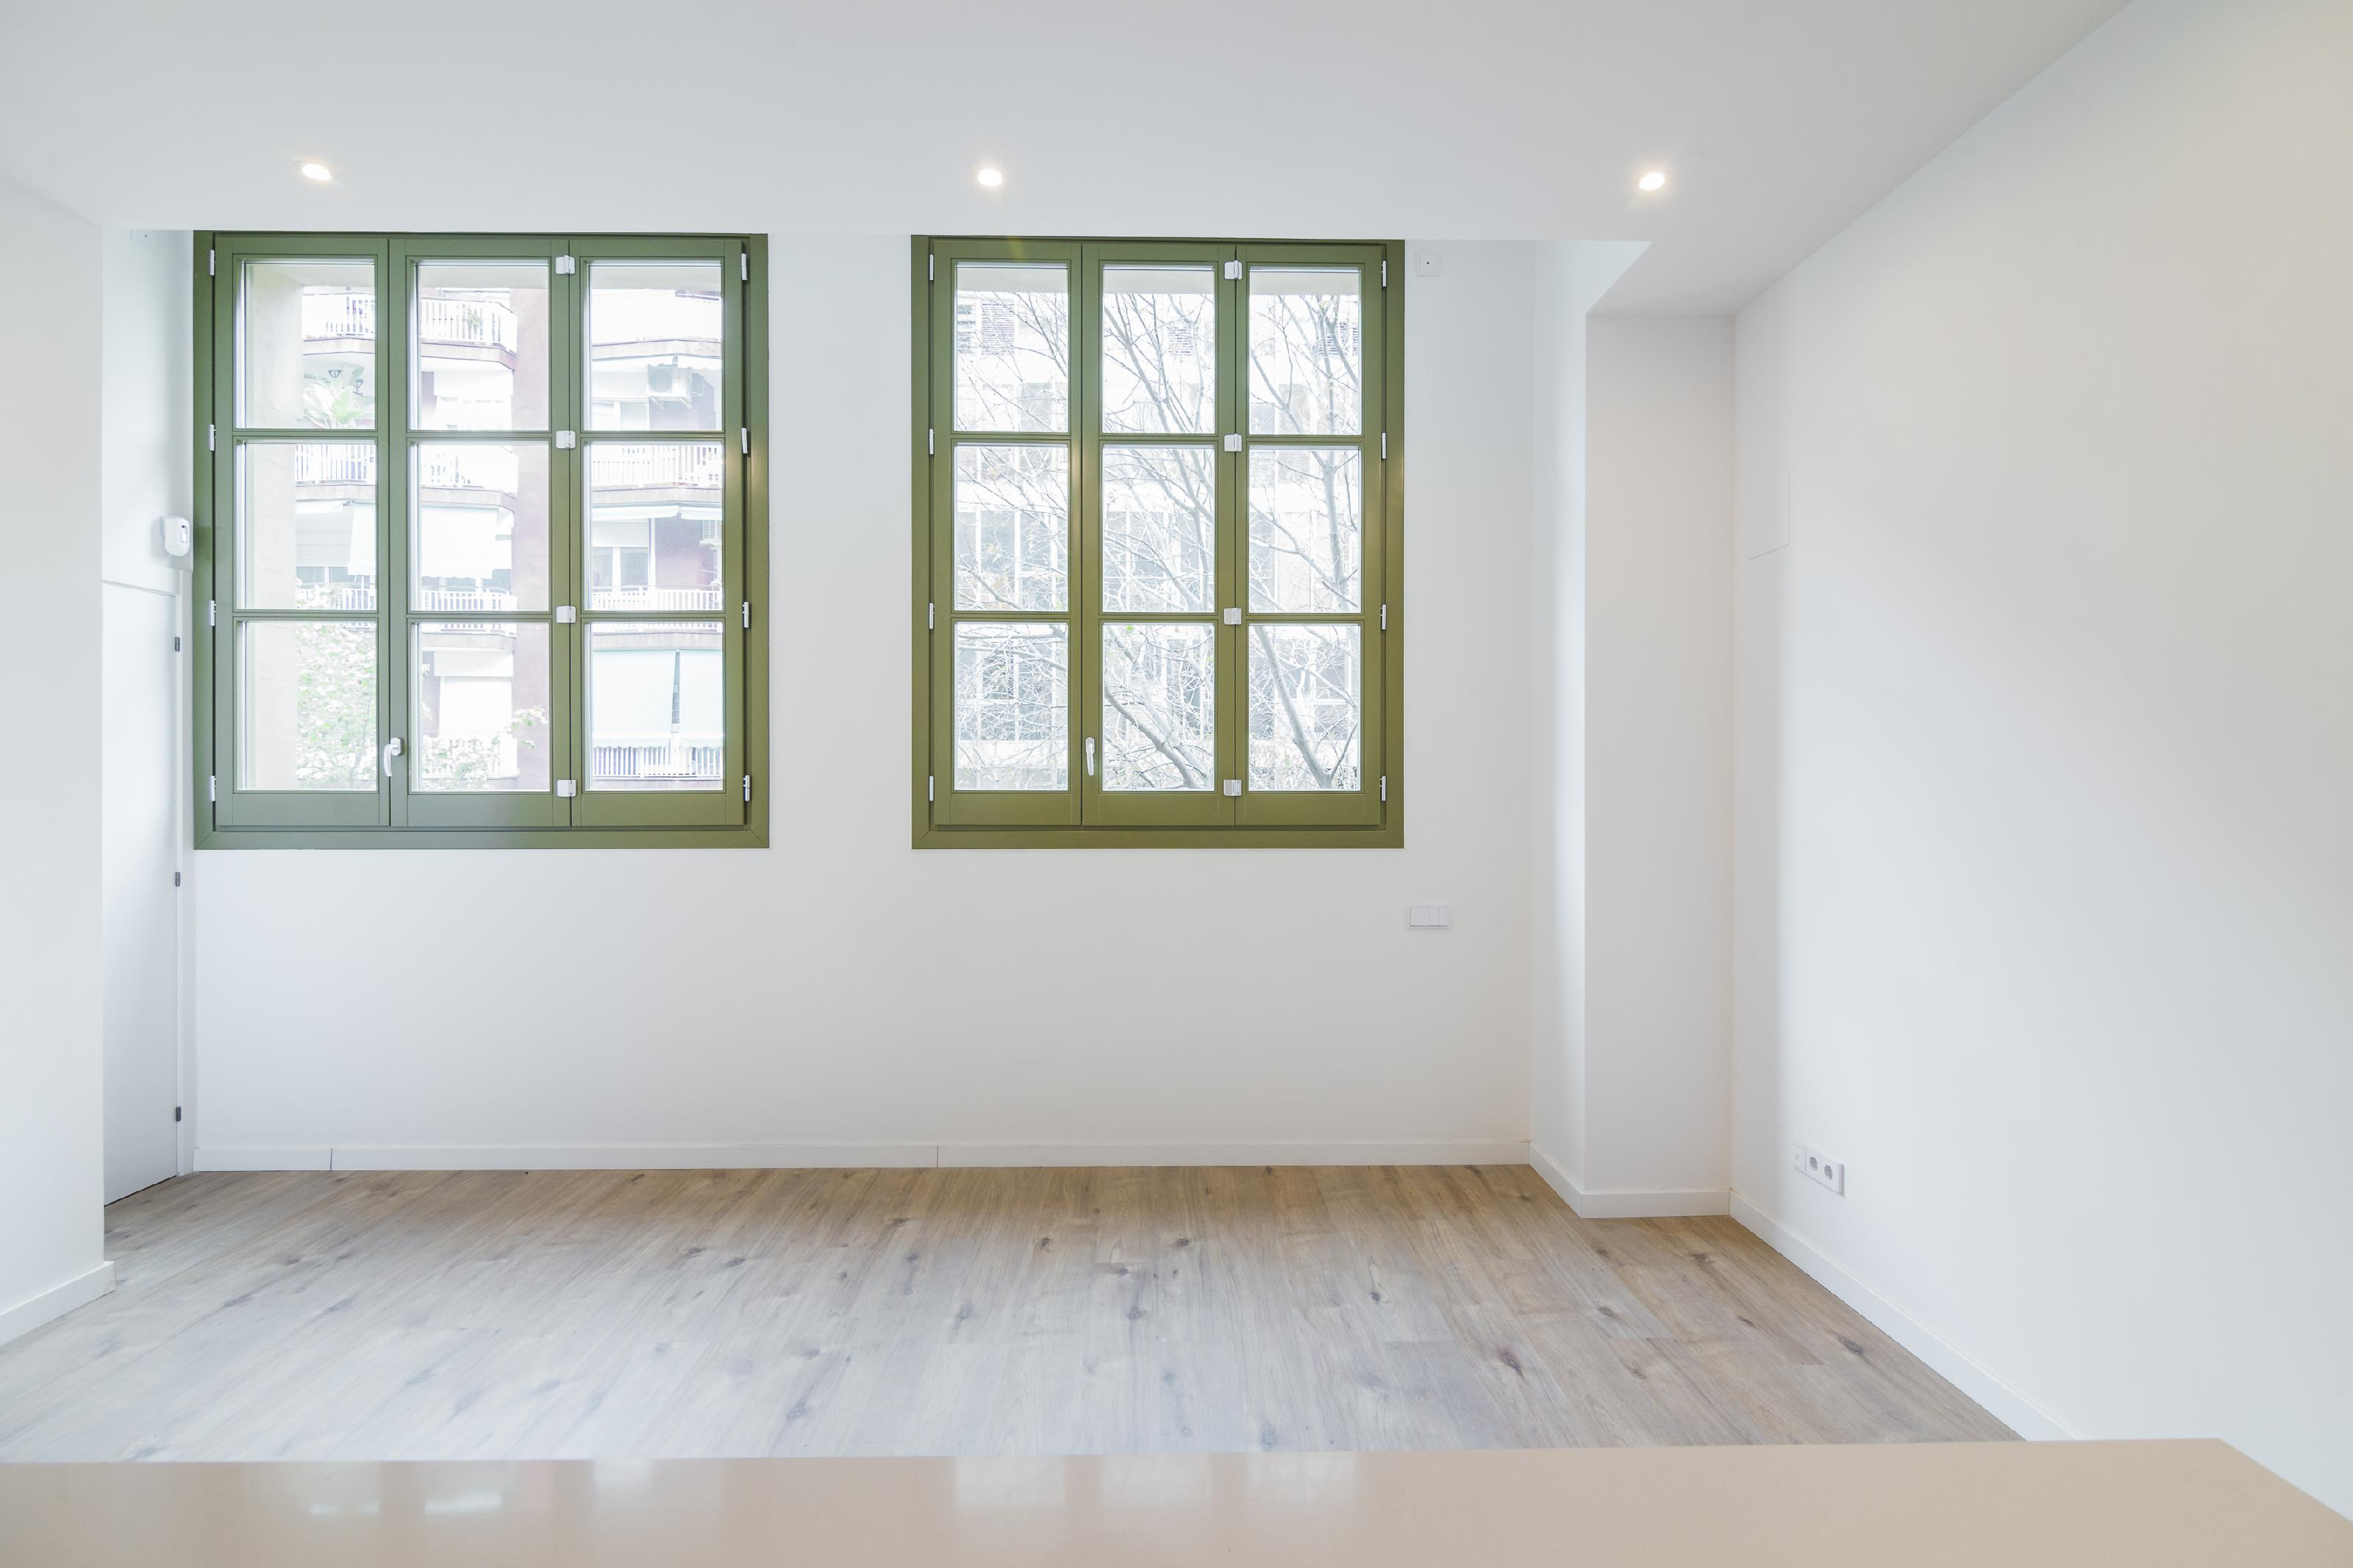 249267 Flat for sale in Eixample, Nova Esquerra Eixample 16